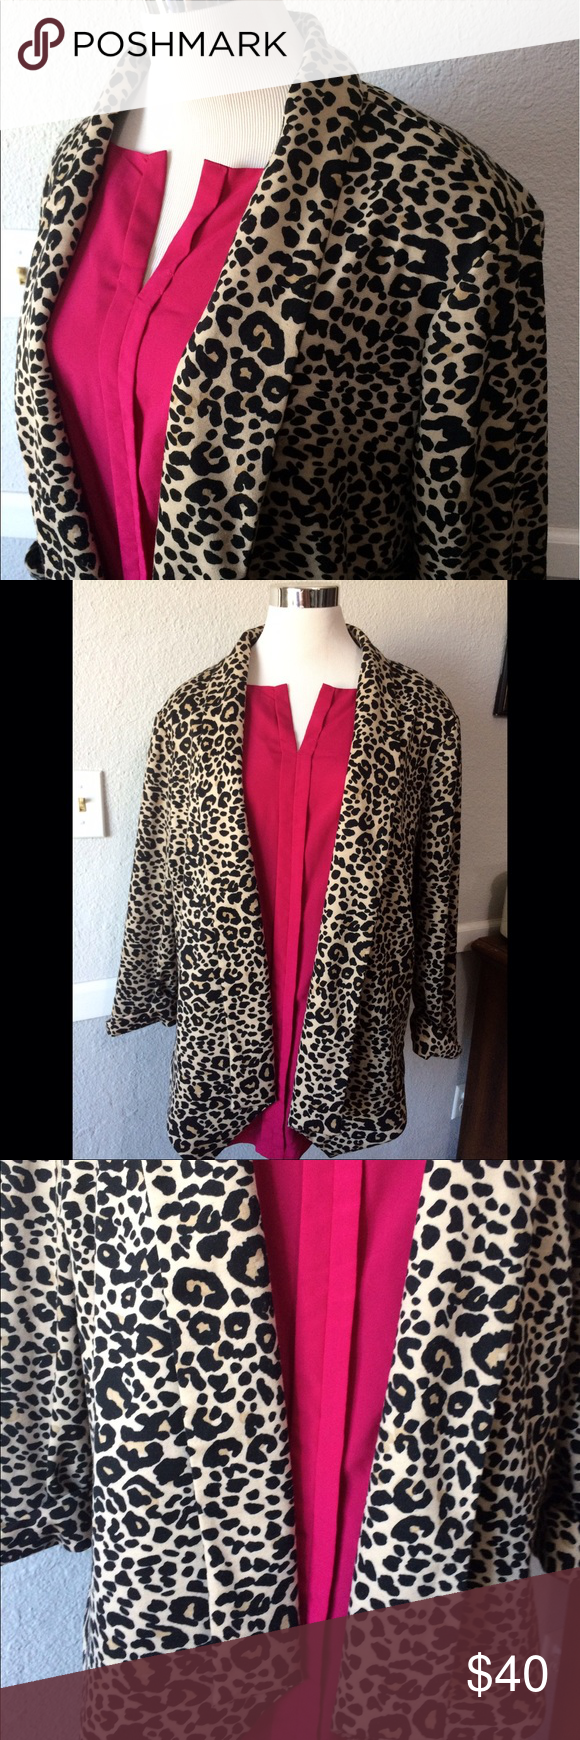 CATO Leopard Waterfall Cardigan Plus Size 22   Leopards, Stylish ...